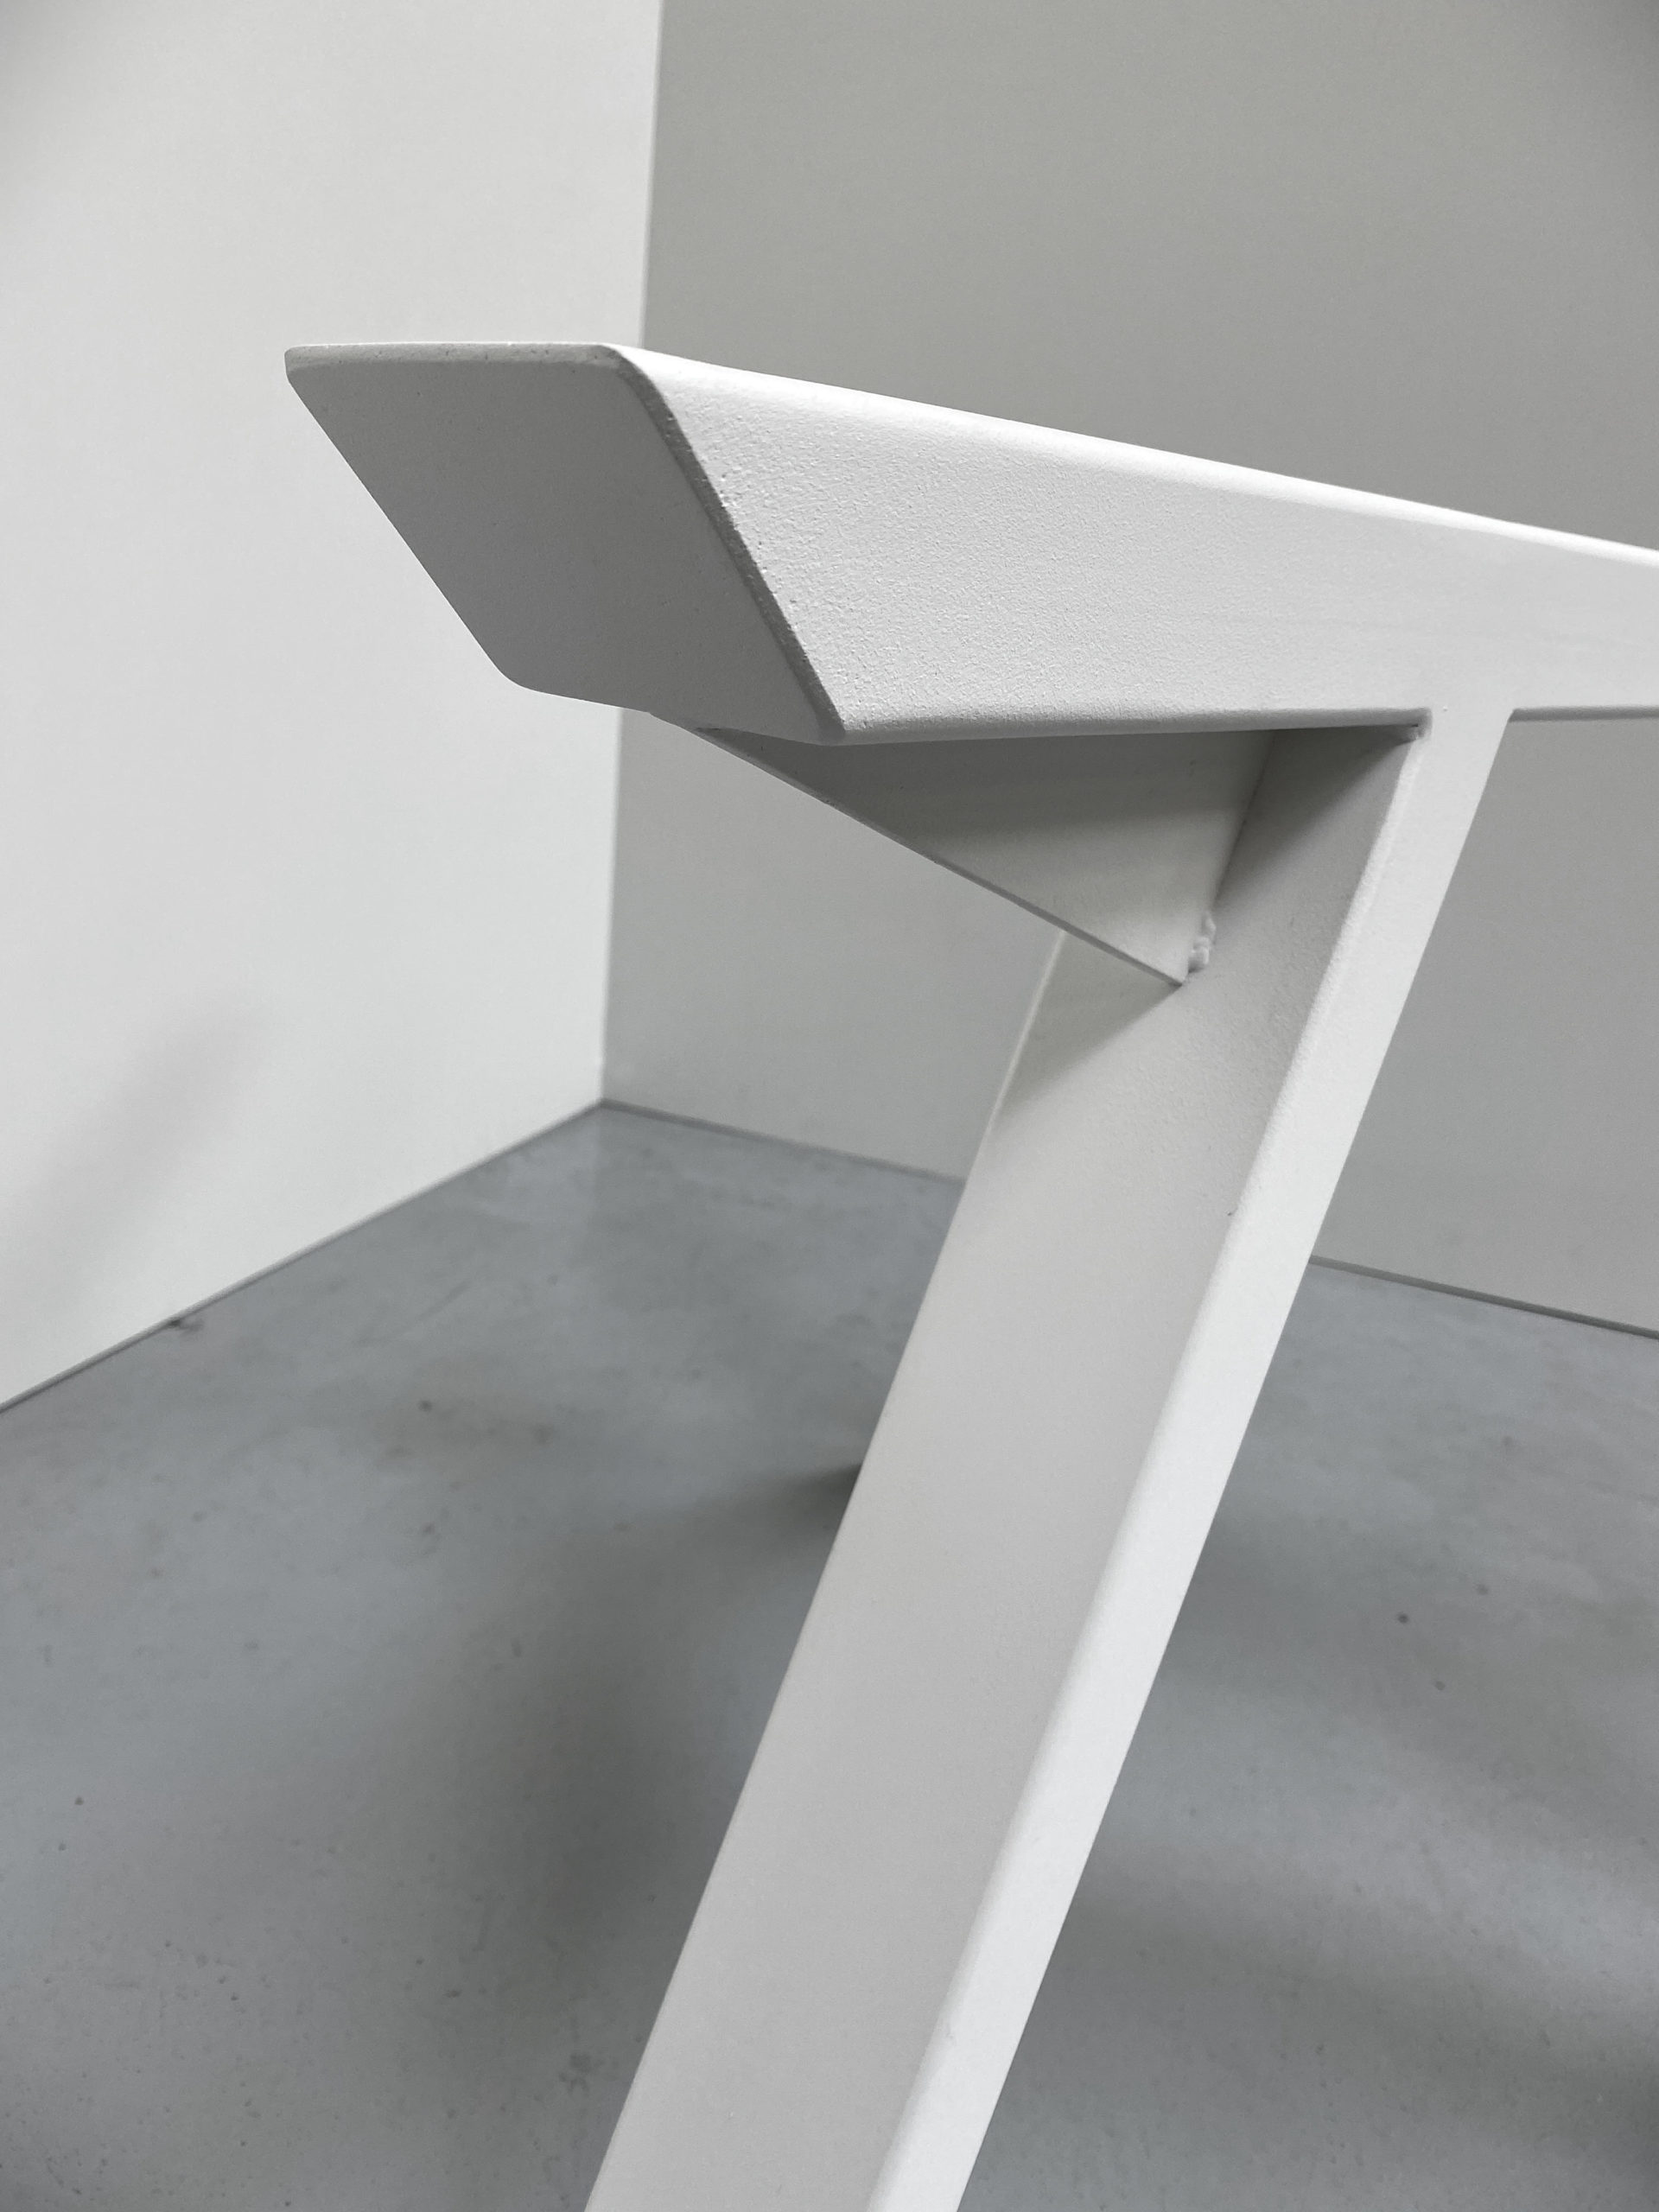 ARTMETA pied de table Tripode en acier sur mesure / Table Tripode